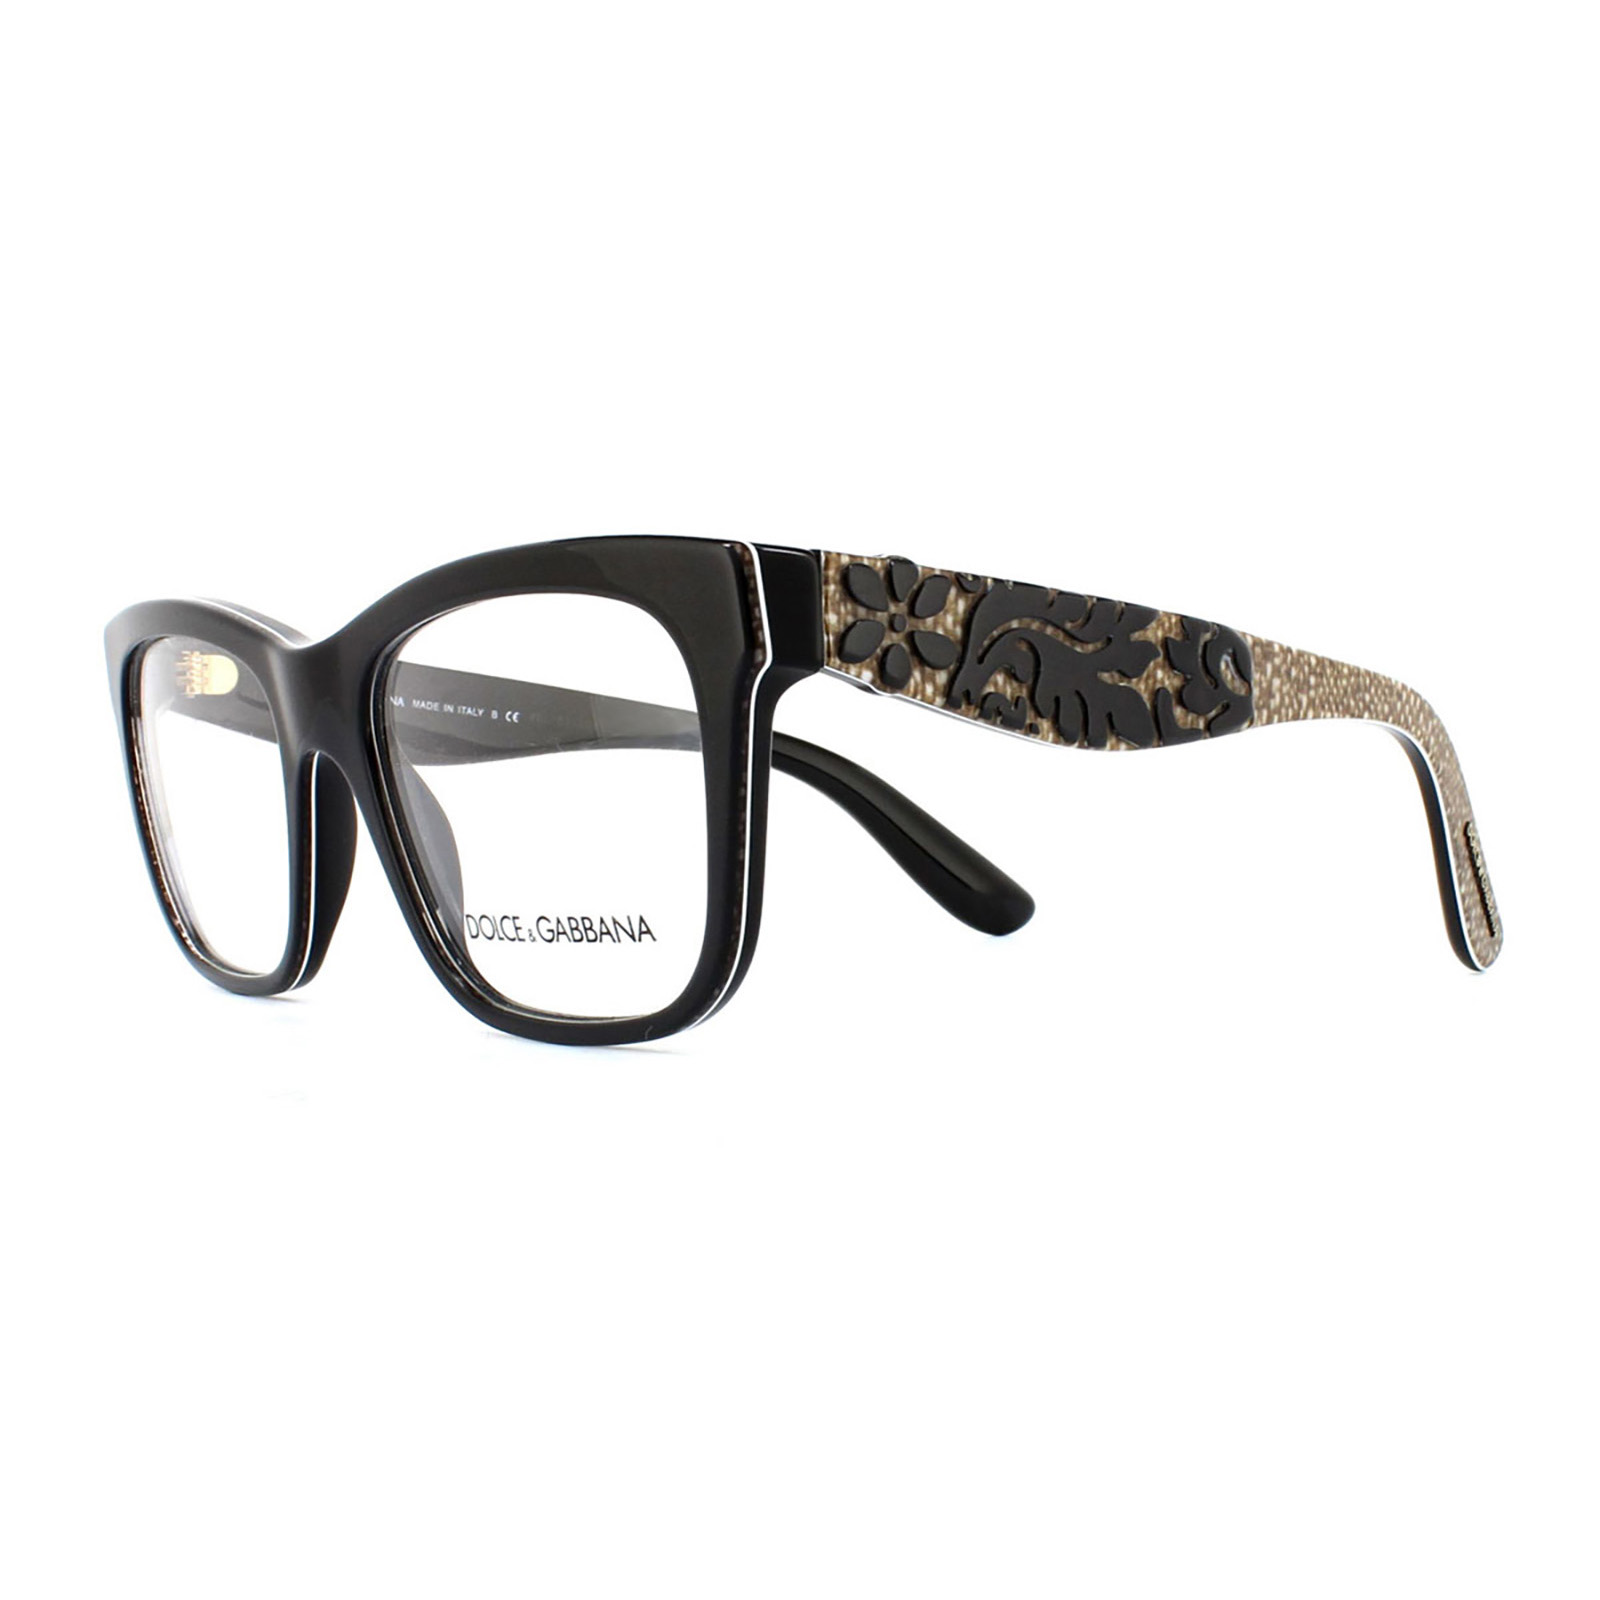 5a7f24da464 Sentinel Dolce and Gabbana Glasses Frames 3239 2998 Top Black Texture  Tissue Womens 52mm